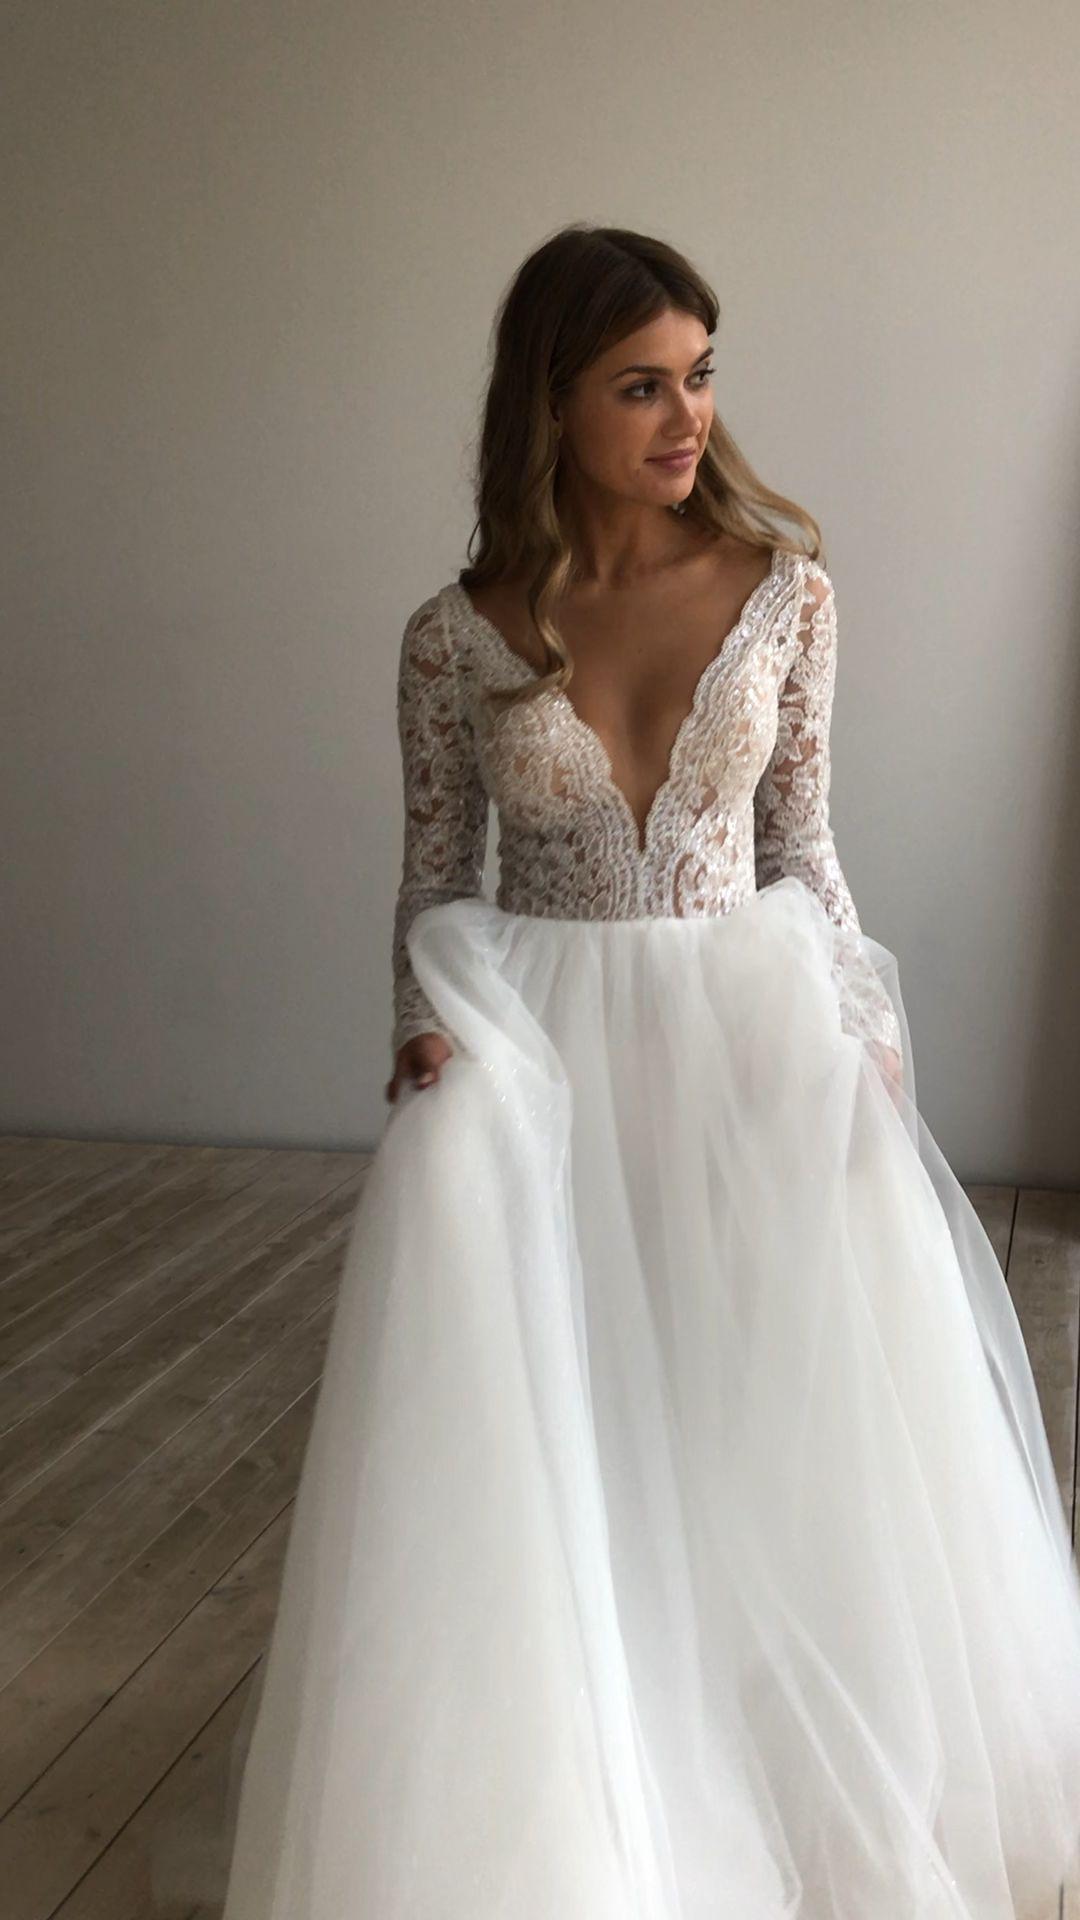 Wedding Dresses Wedding Gowns 2020 Emerald Green Satin